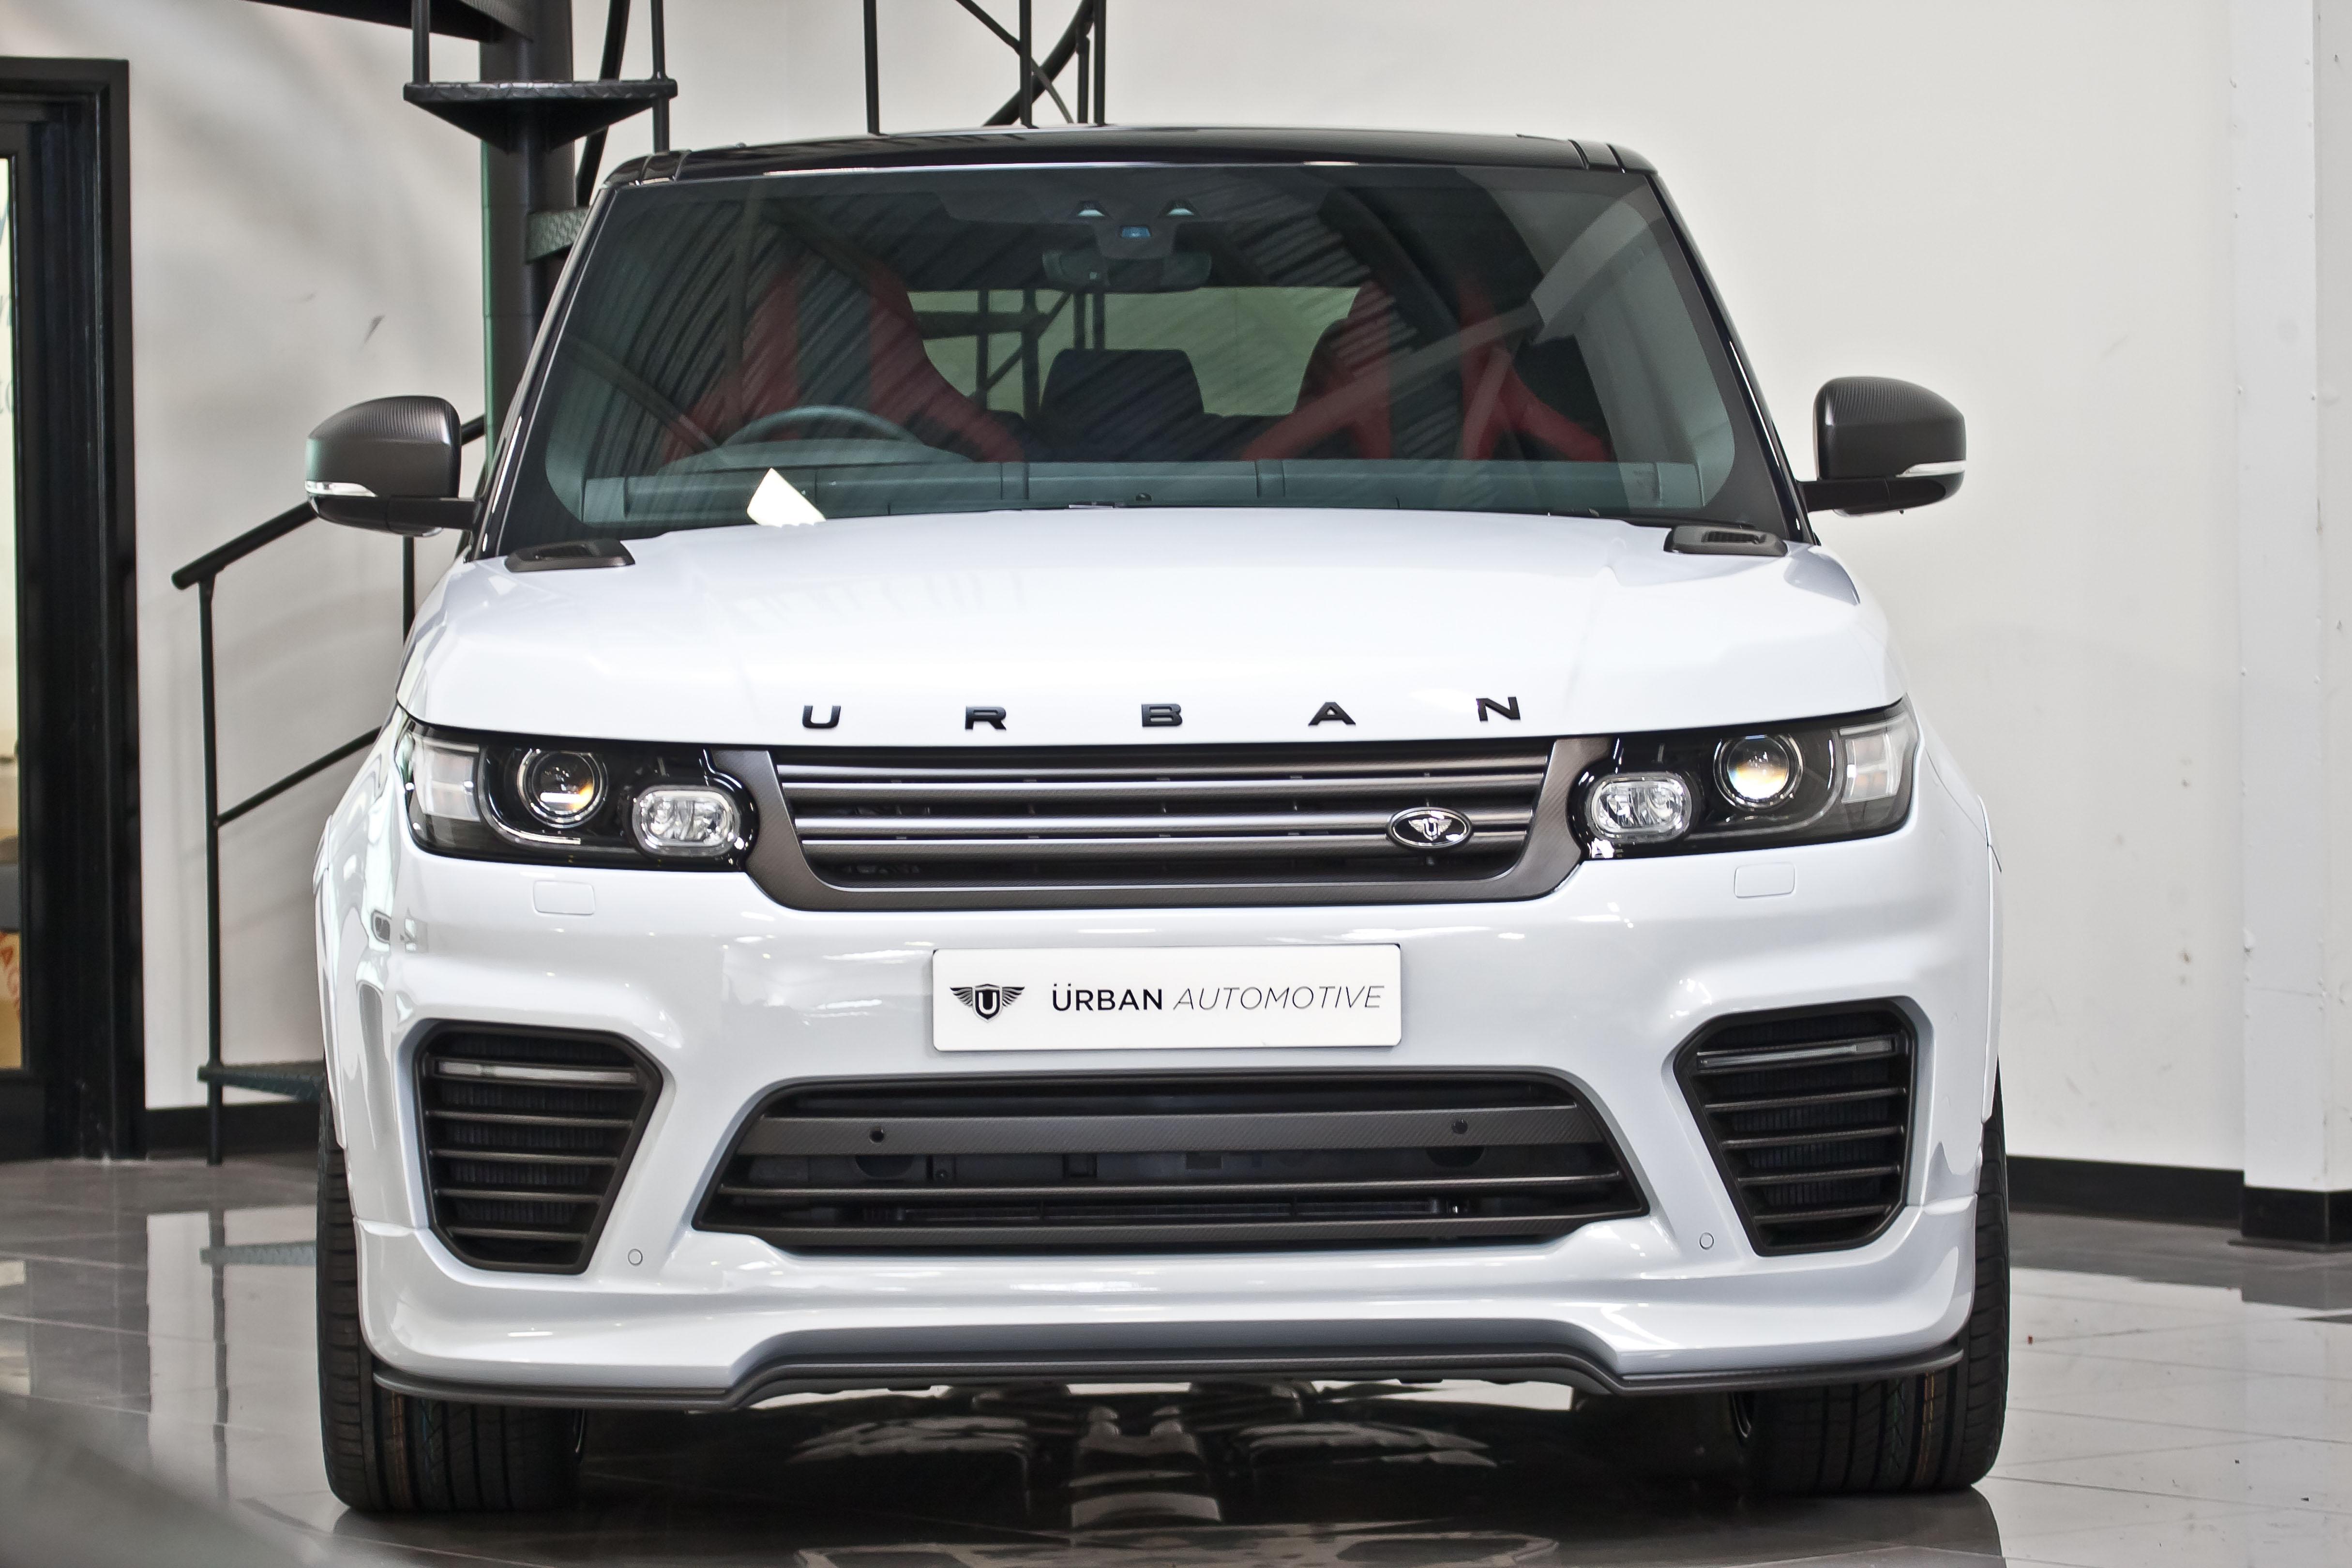 Range Rover SVR Yulong Matte Carbon27